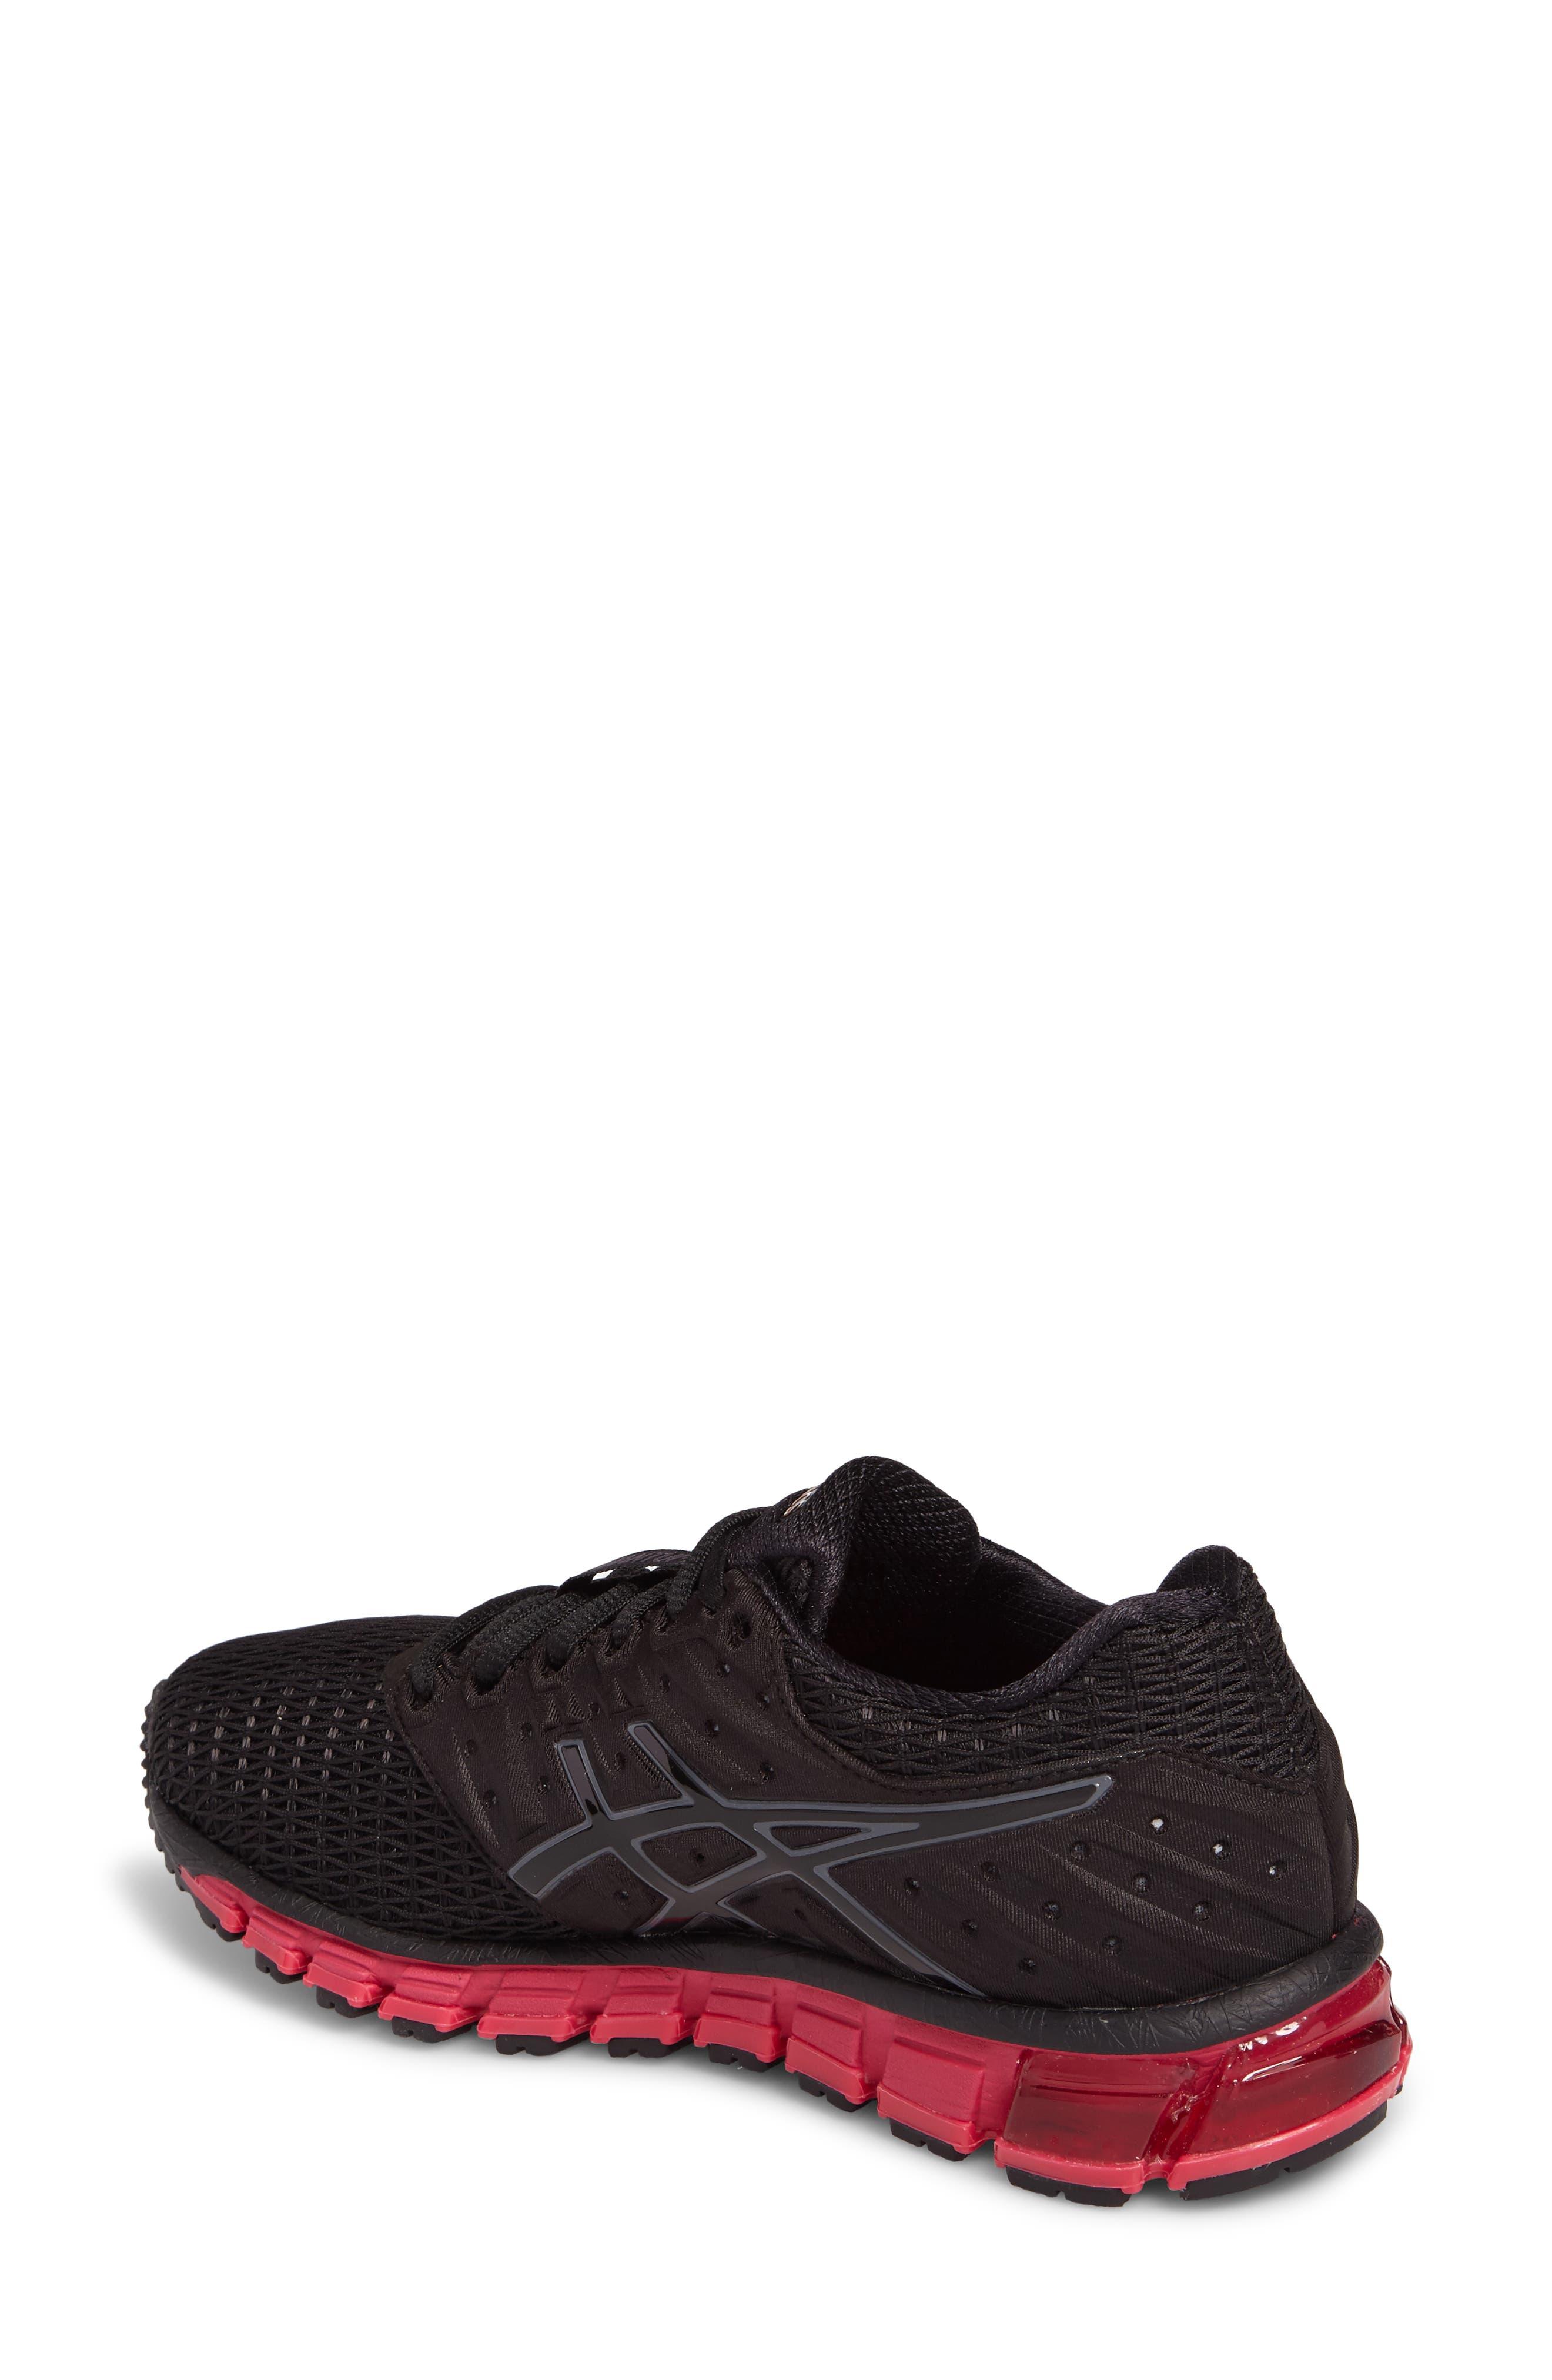 'GEL-Quantum 180 2' Running Shoe,                             Alternate thumbnail 8, color,